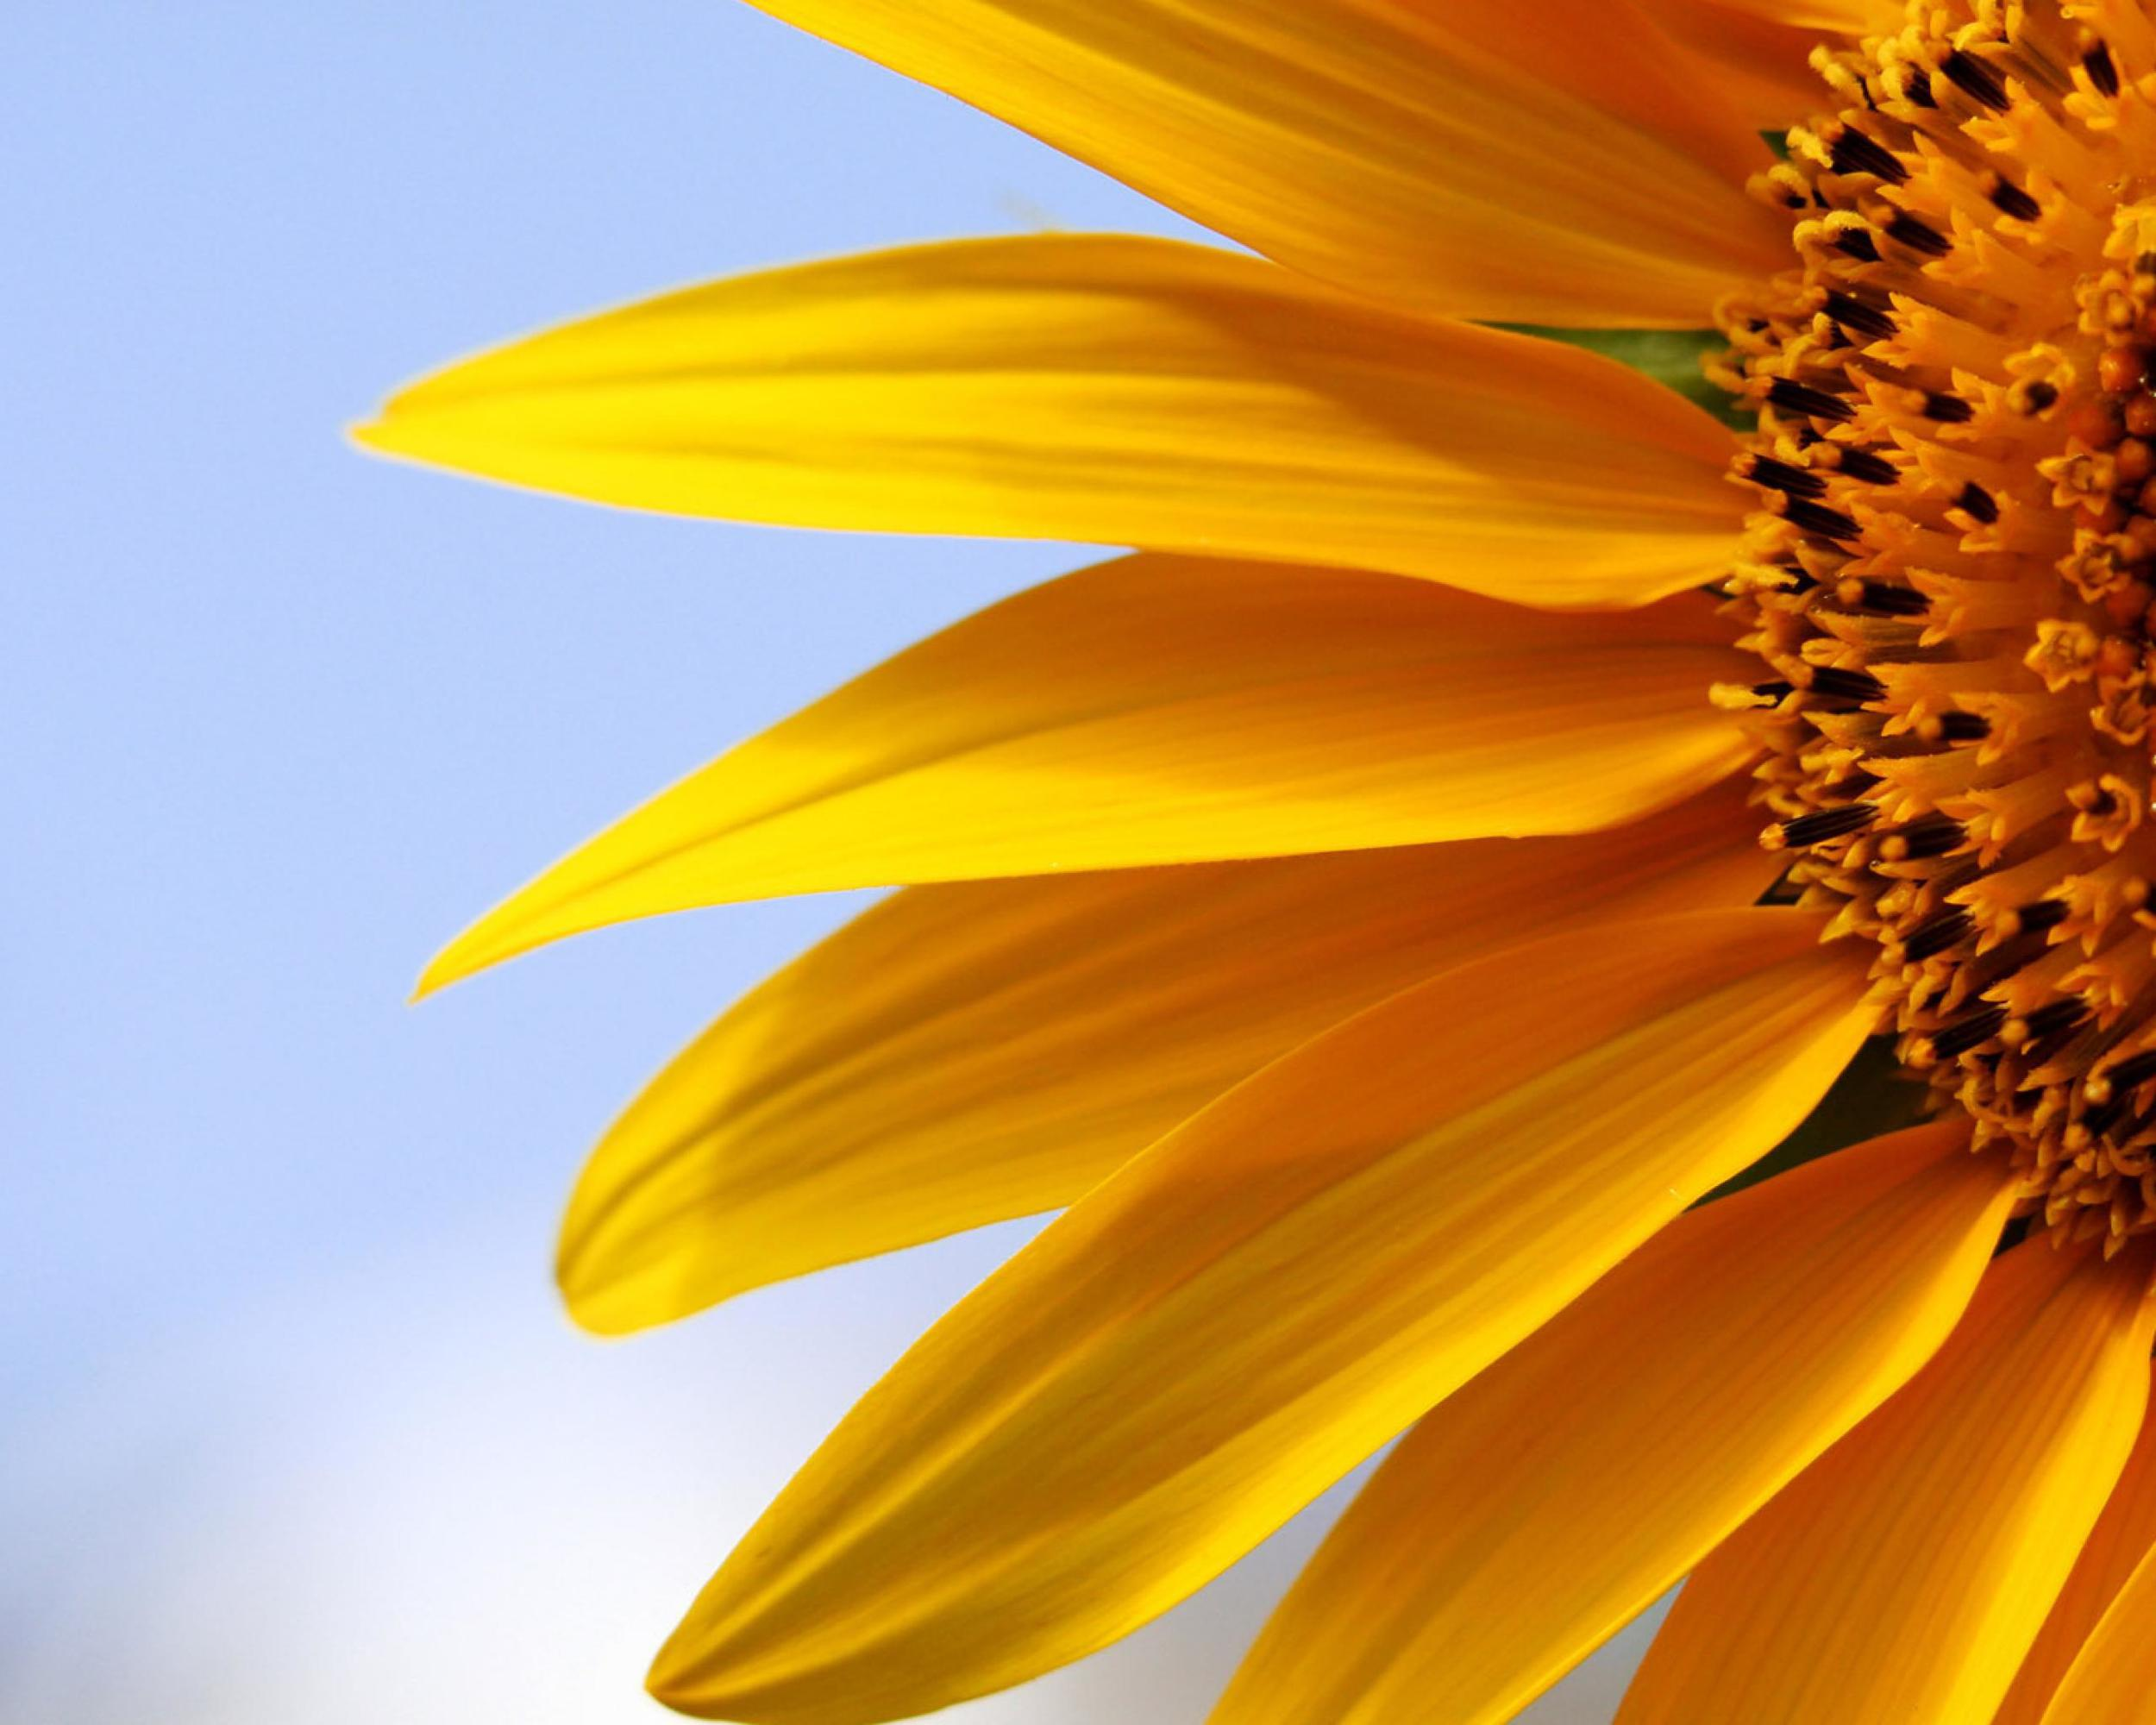 nature-images-flower-sunflower-free-hd-270949.jpg